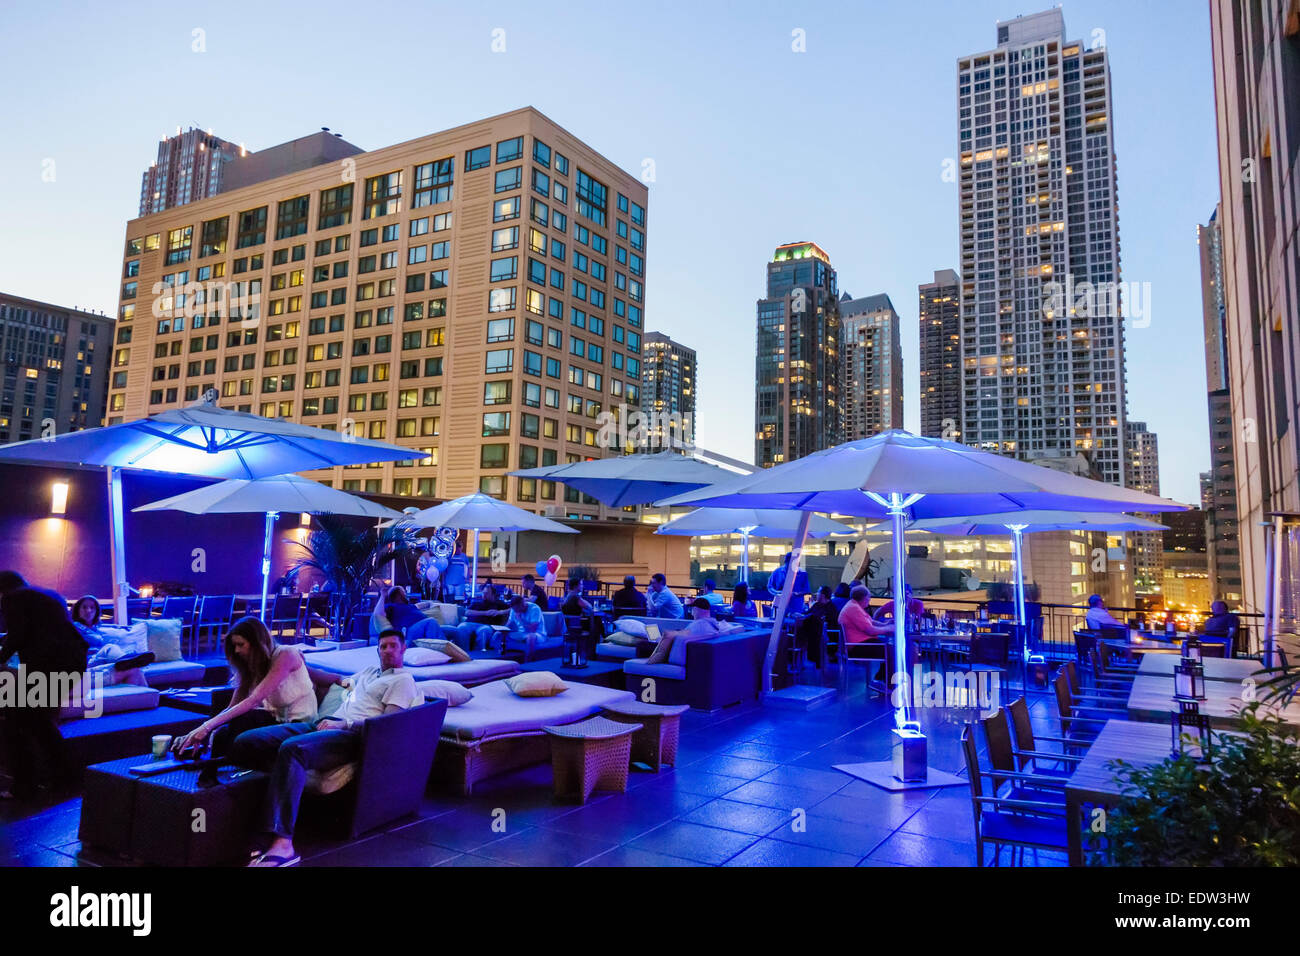 Hilton Chicago Restaurants Near